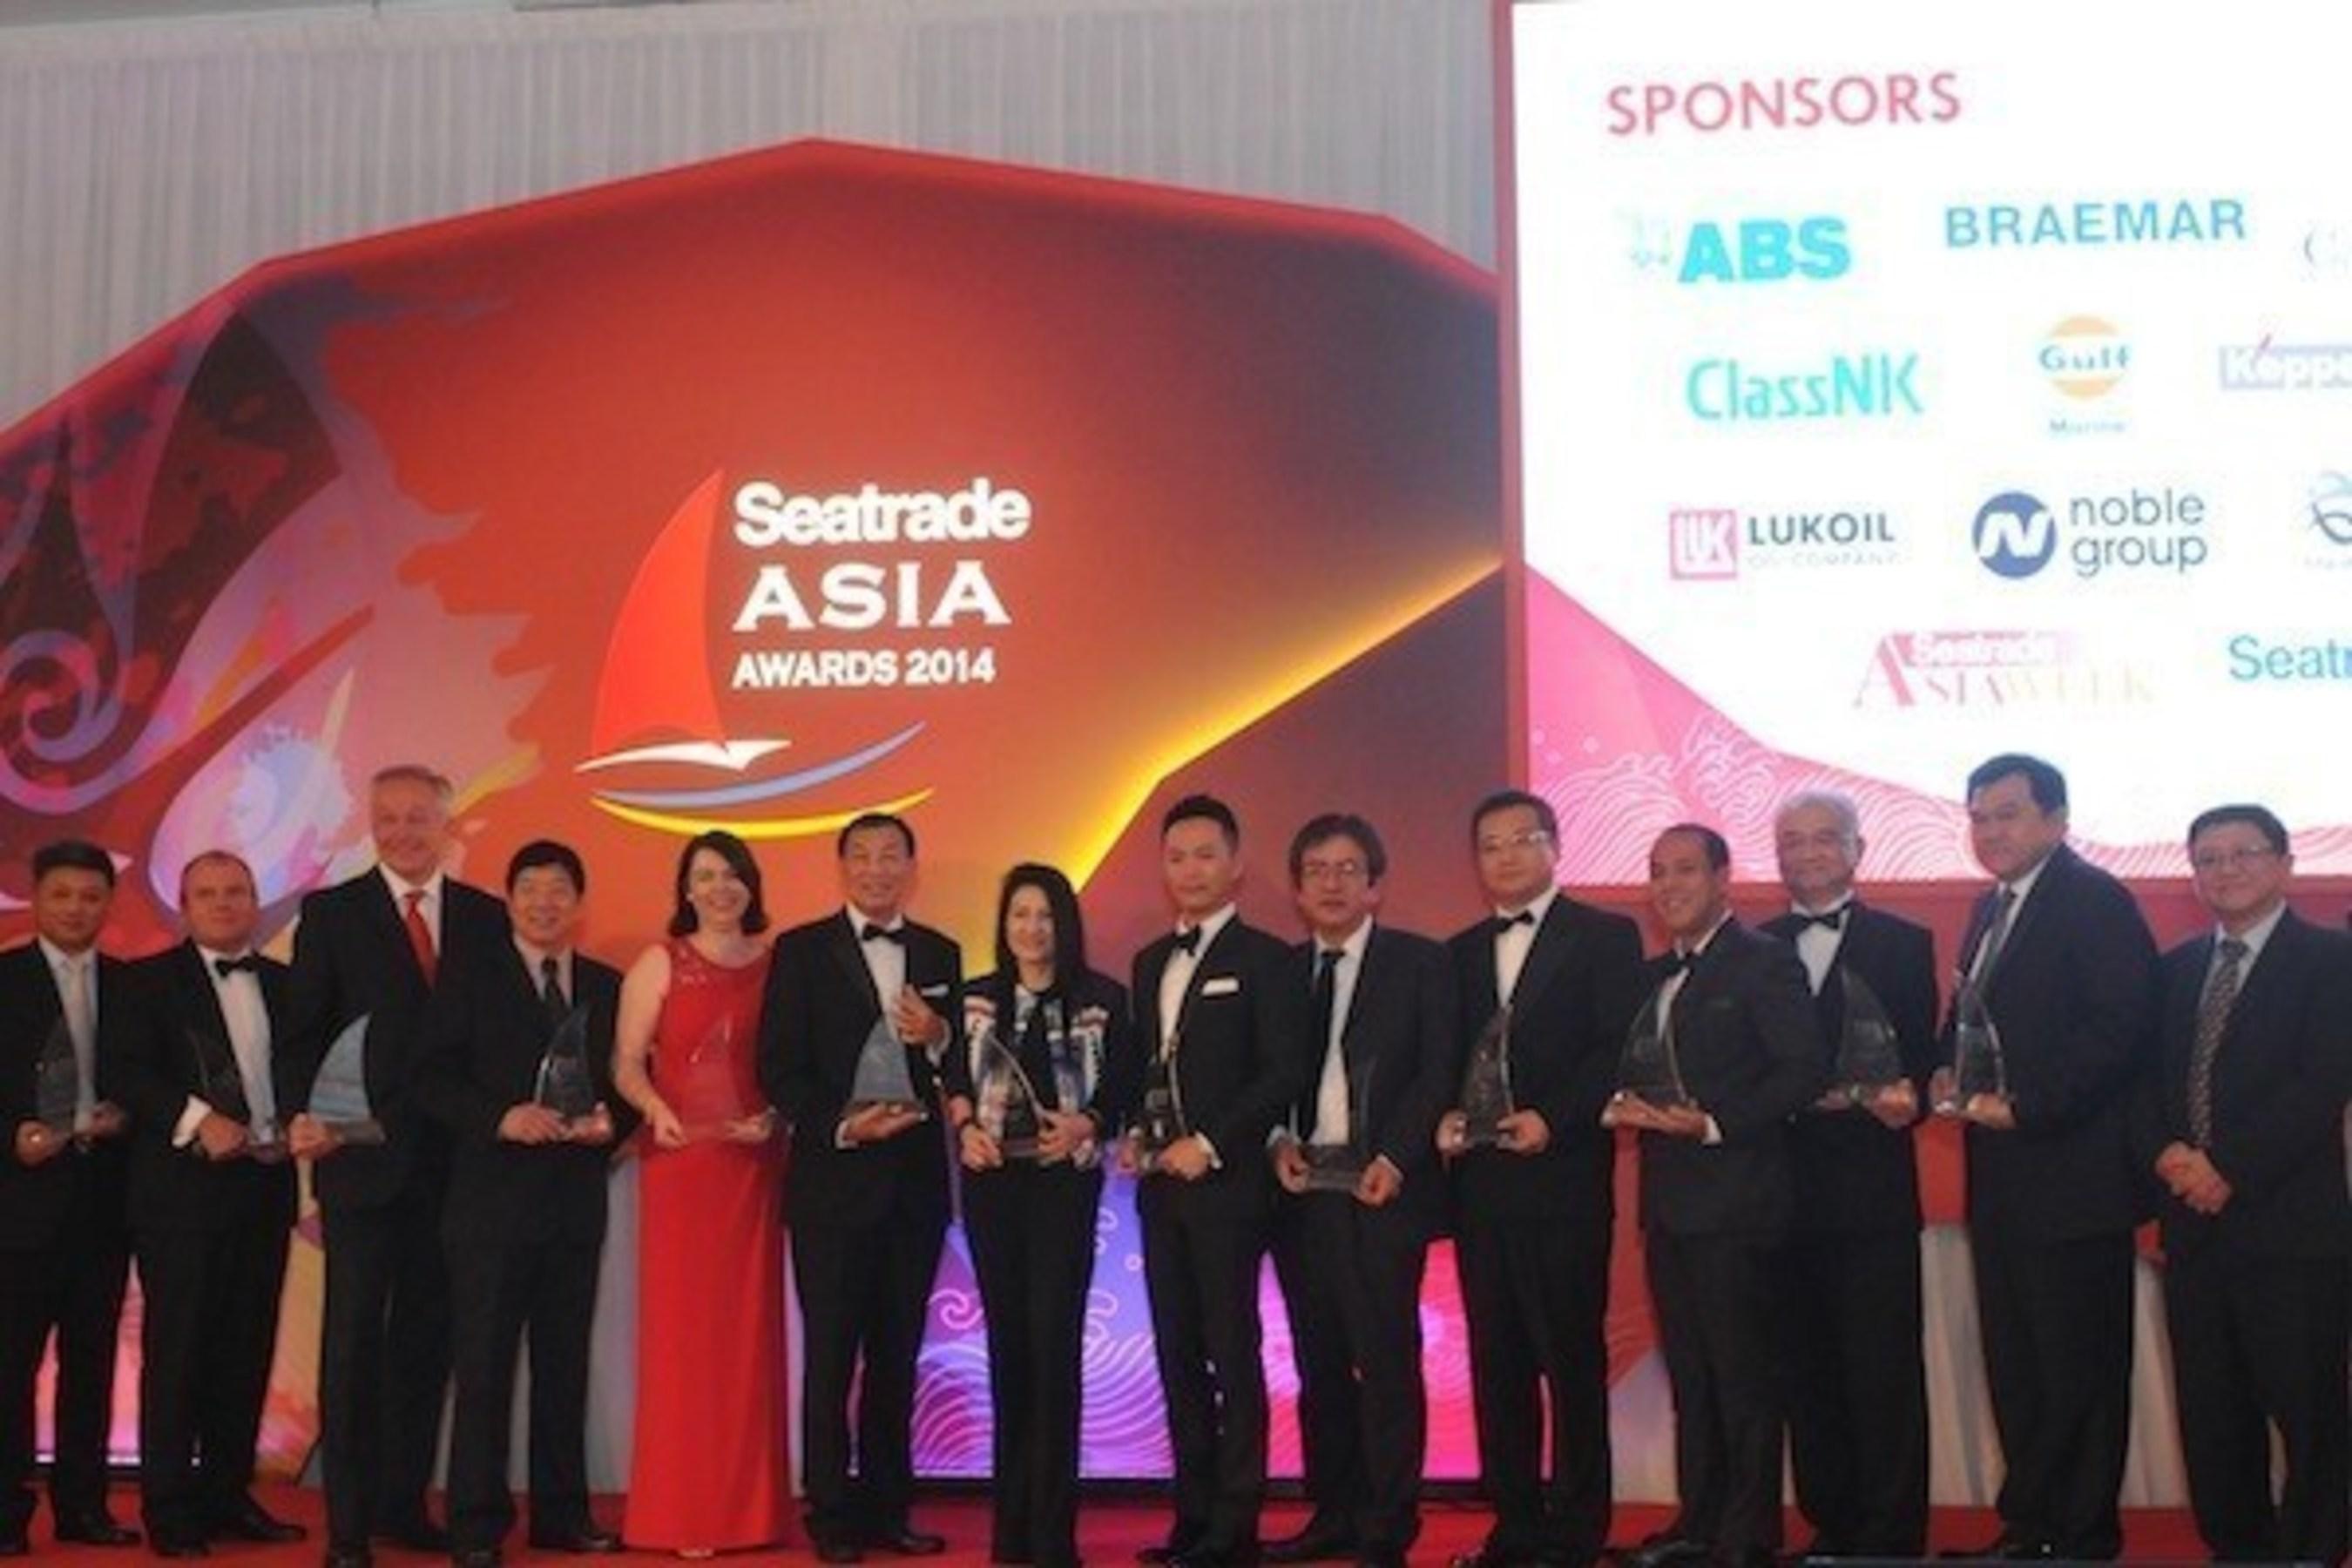 2014 Seatrade Asia Awards Winners